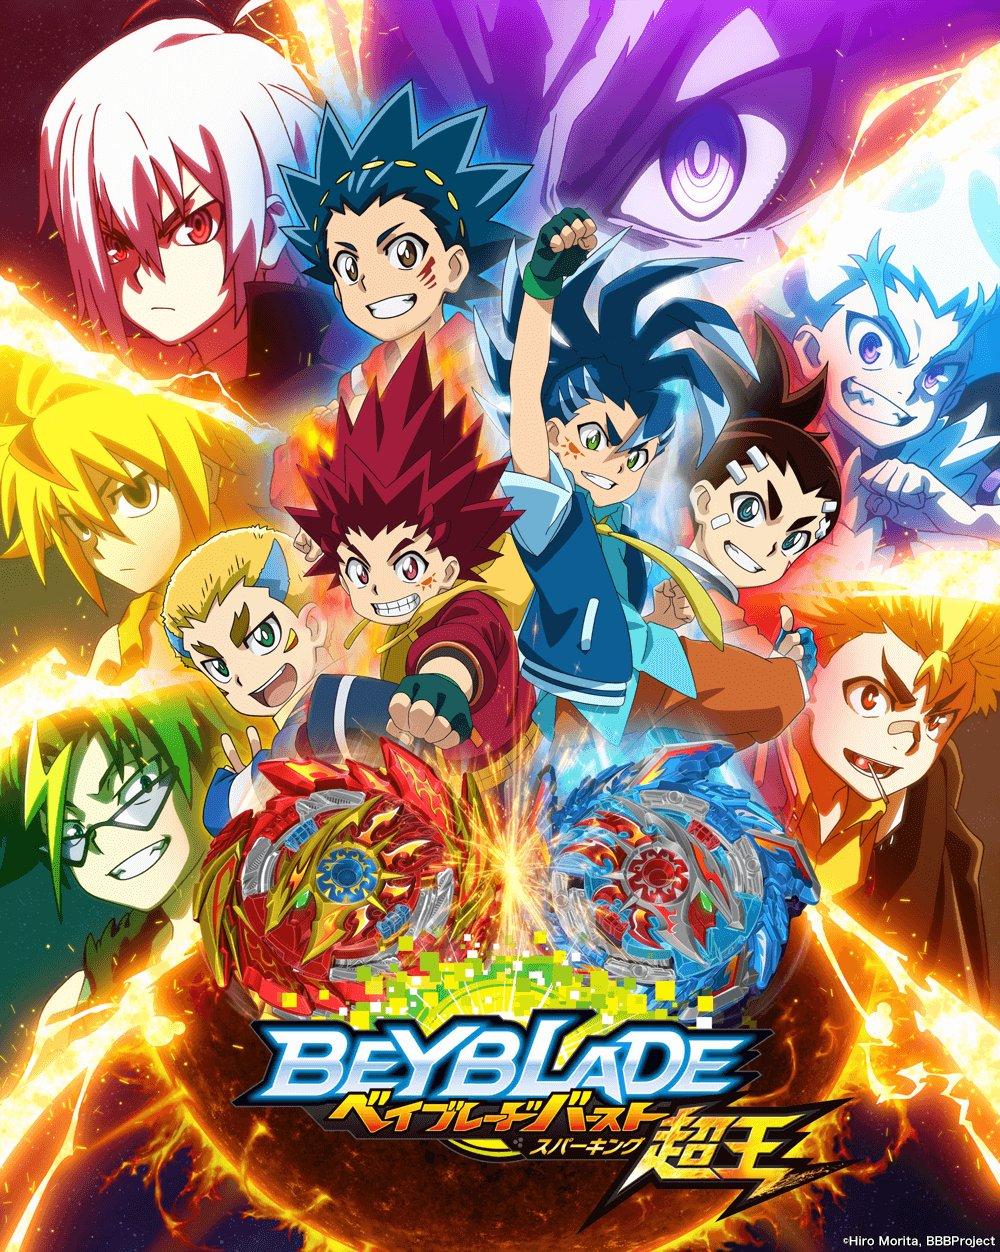 Beyblade Burst Staffel 2